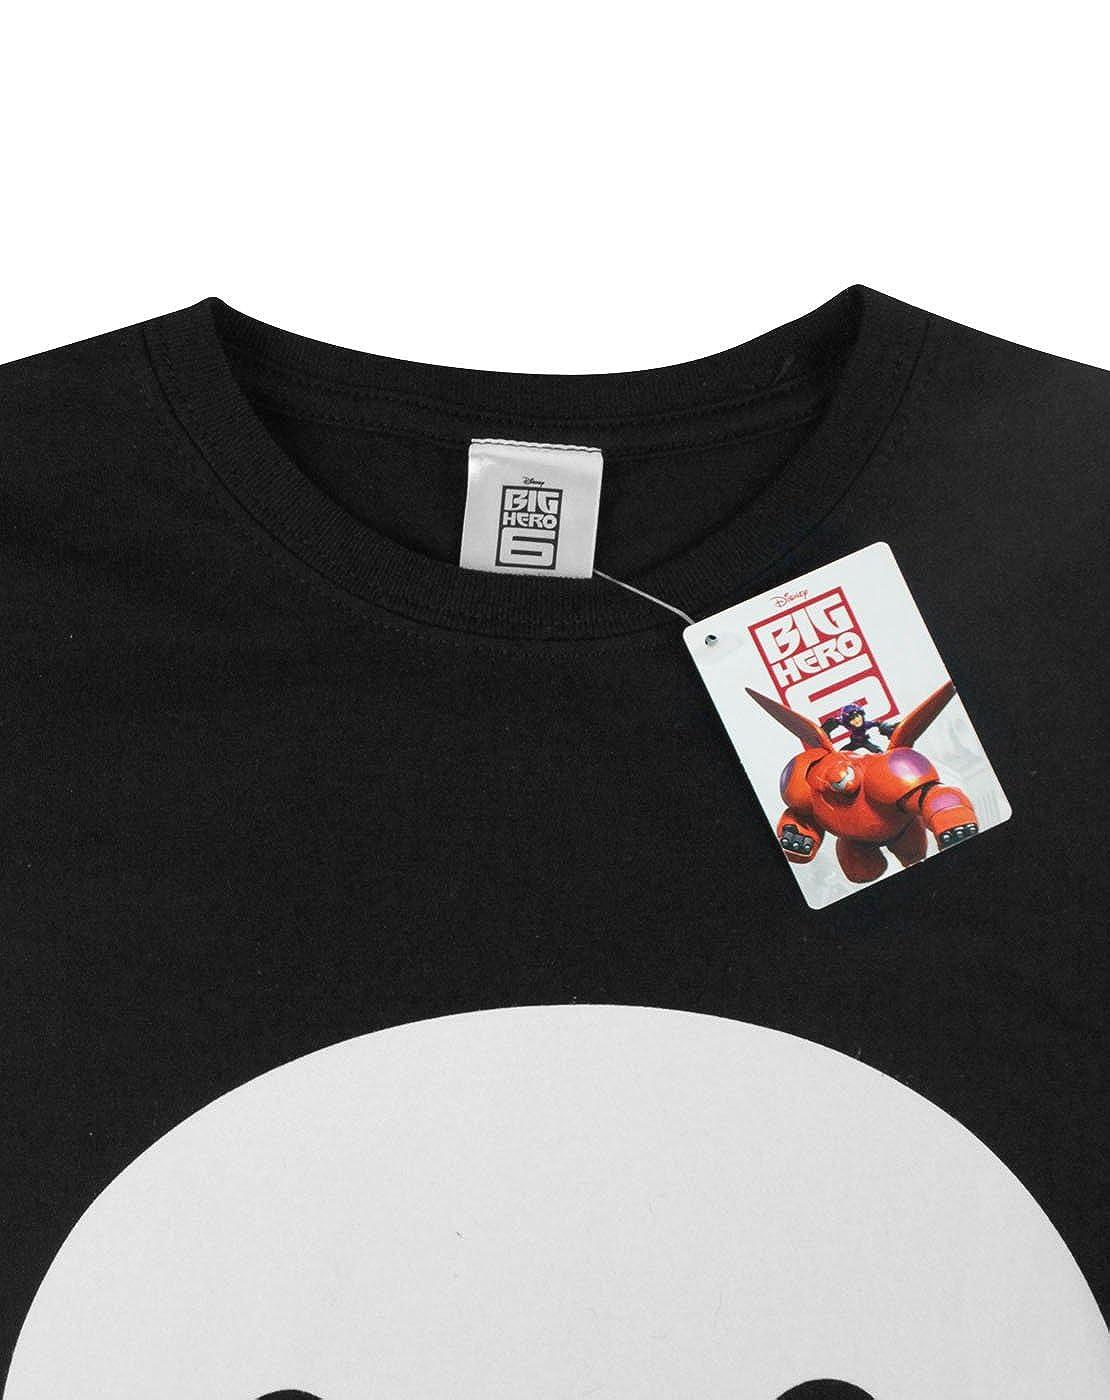 02e7f7f59 Amazon.com: Official Big Hero 6 Baymax Face Women's T-Shirt: Clothing